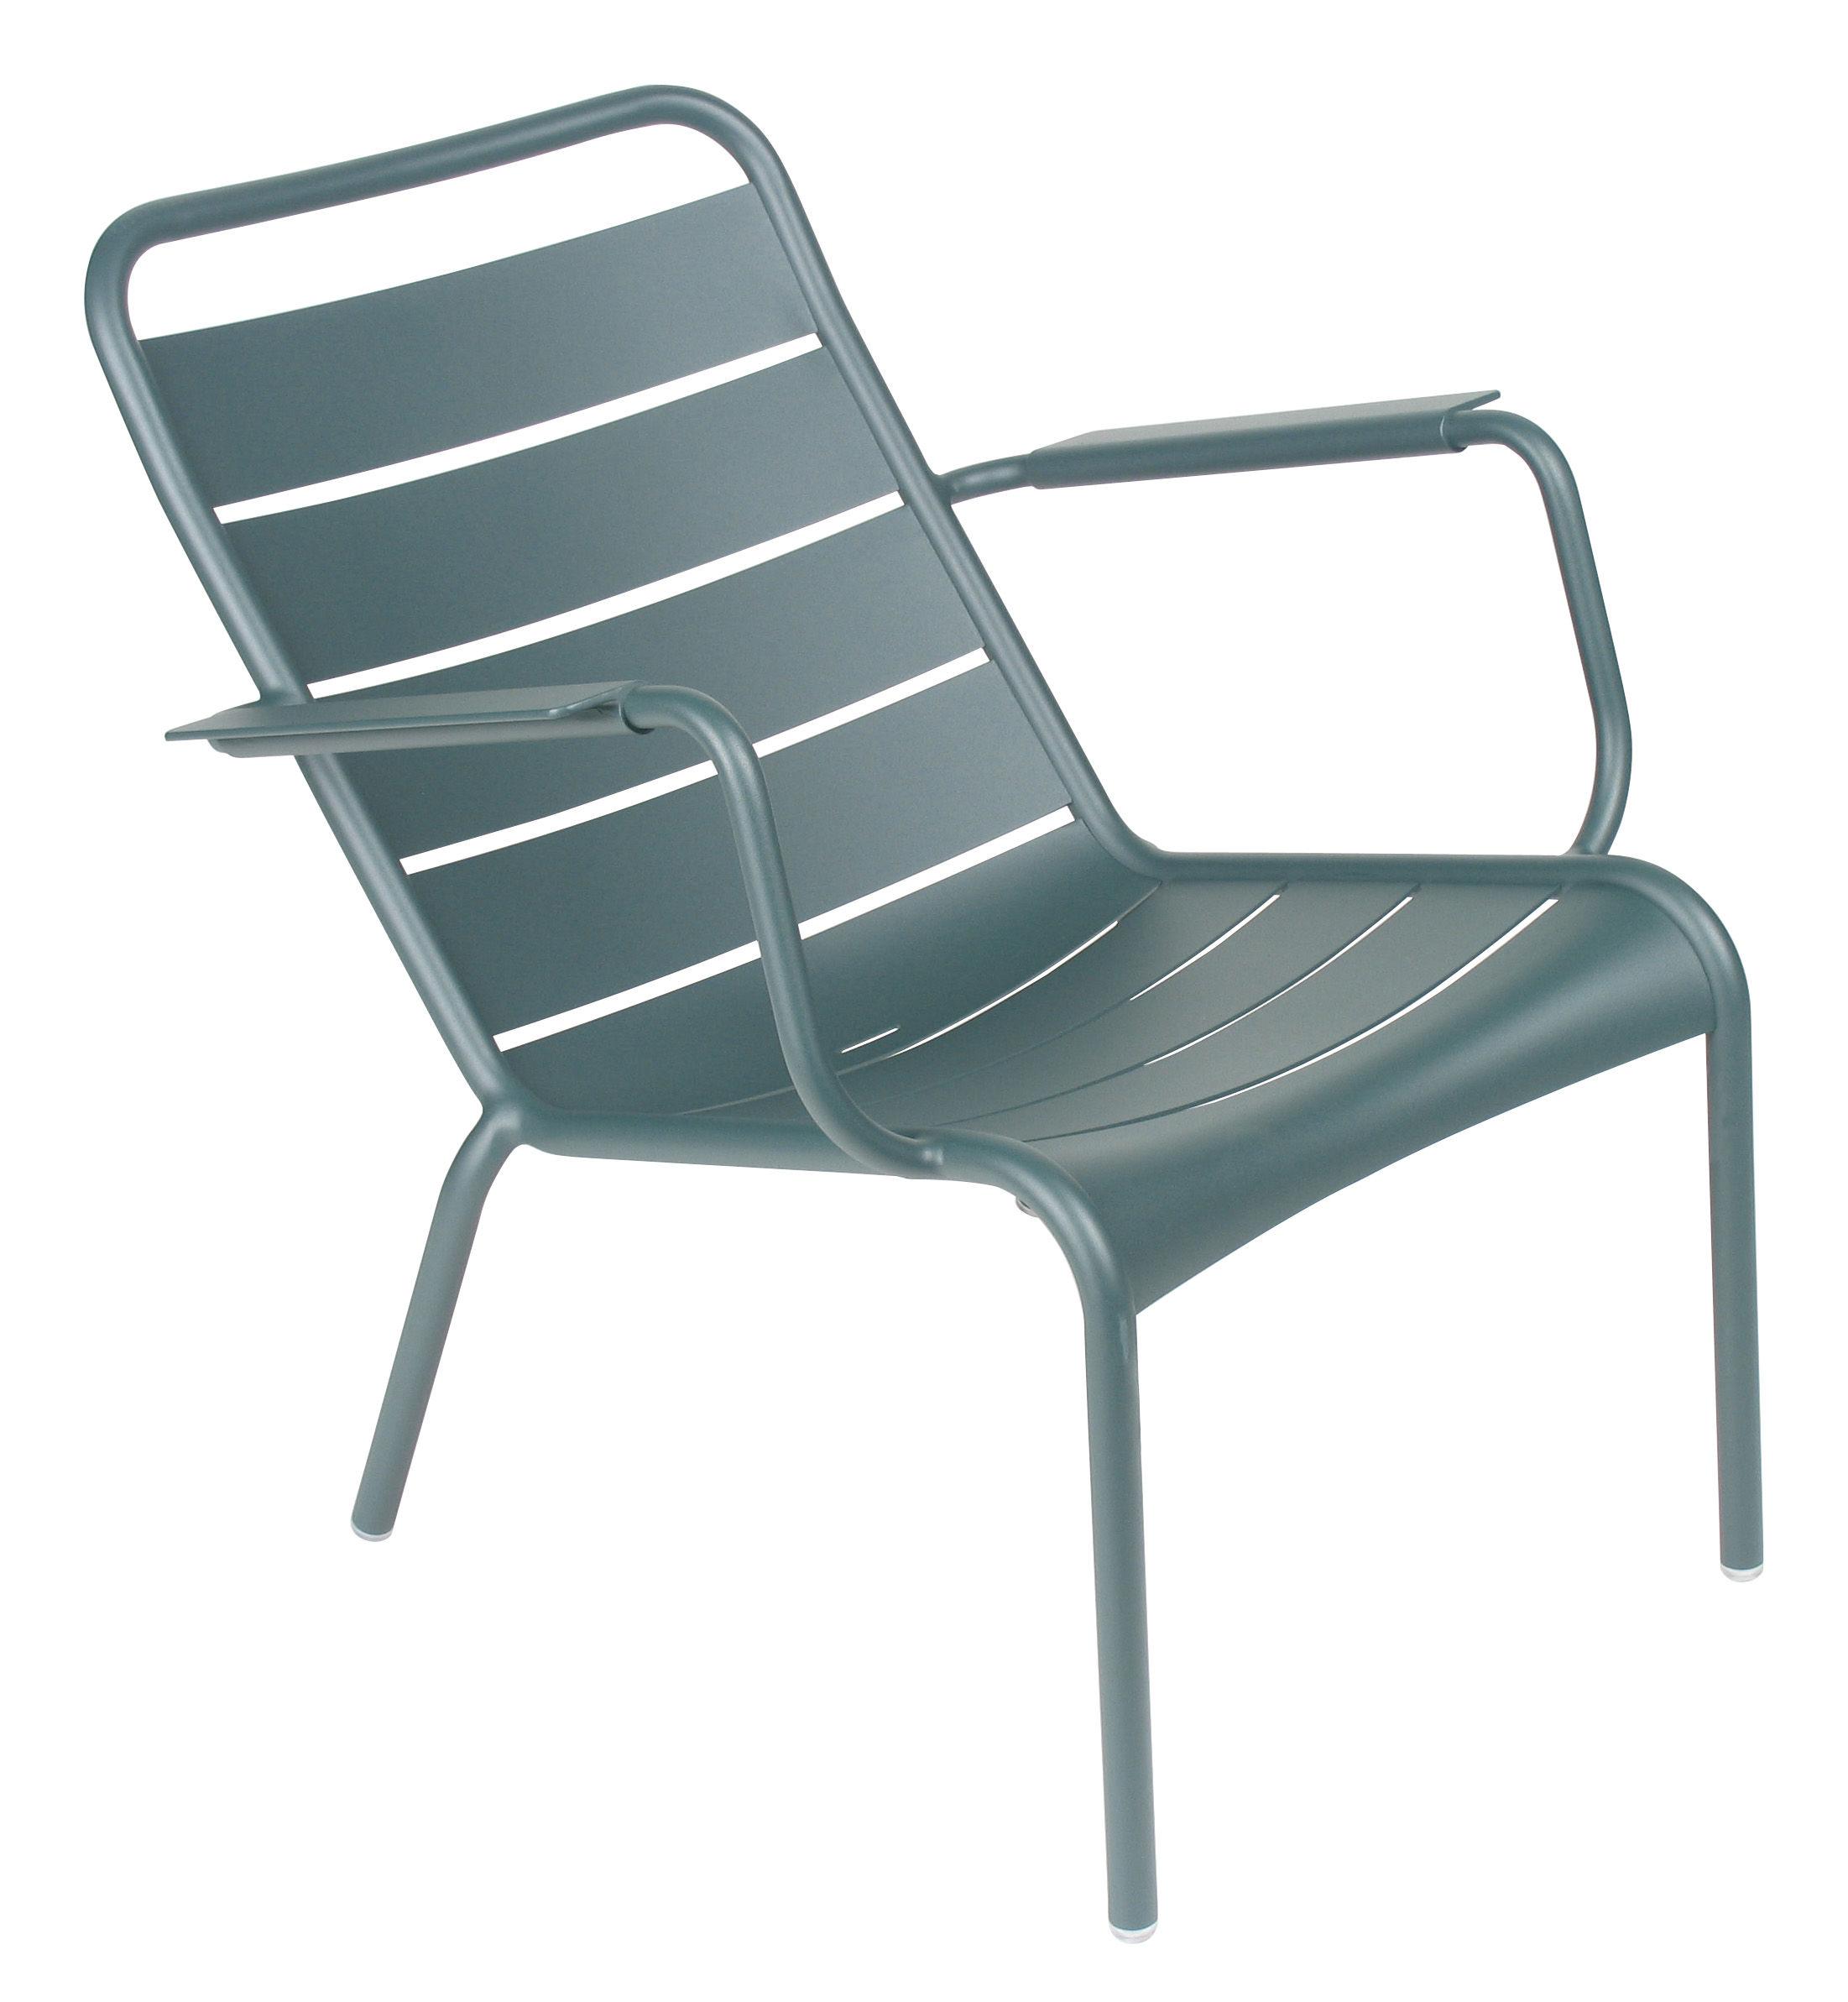 Life Style - Luxembourg Lounge Sessel - Fermob - Zedernholz - lackiertes Aluminium